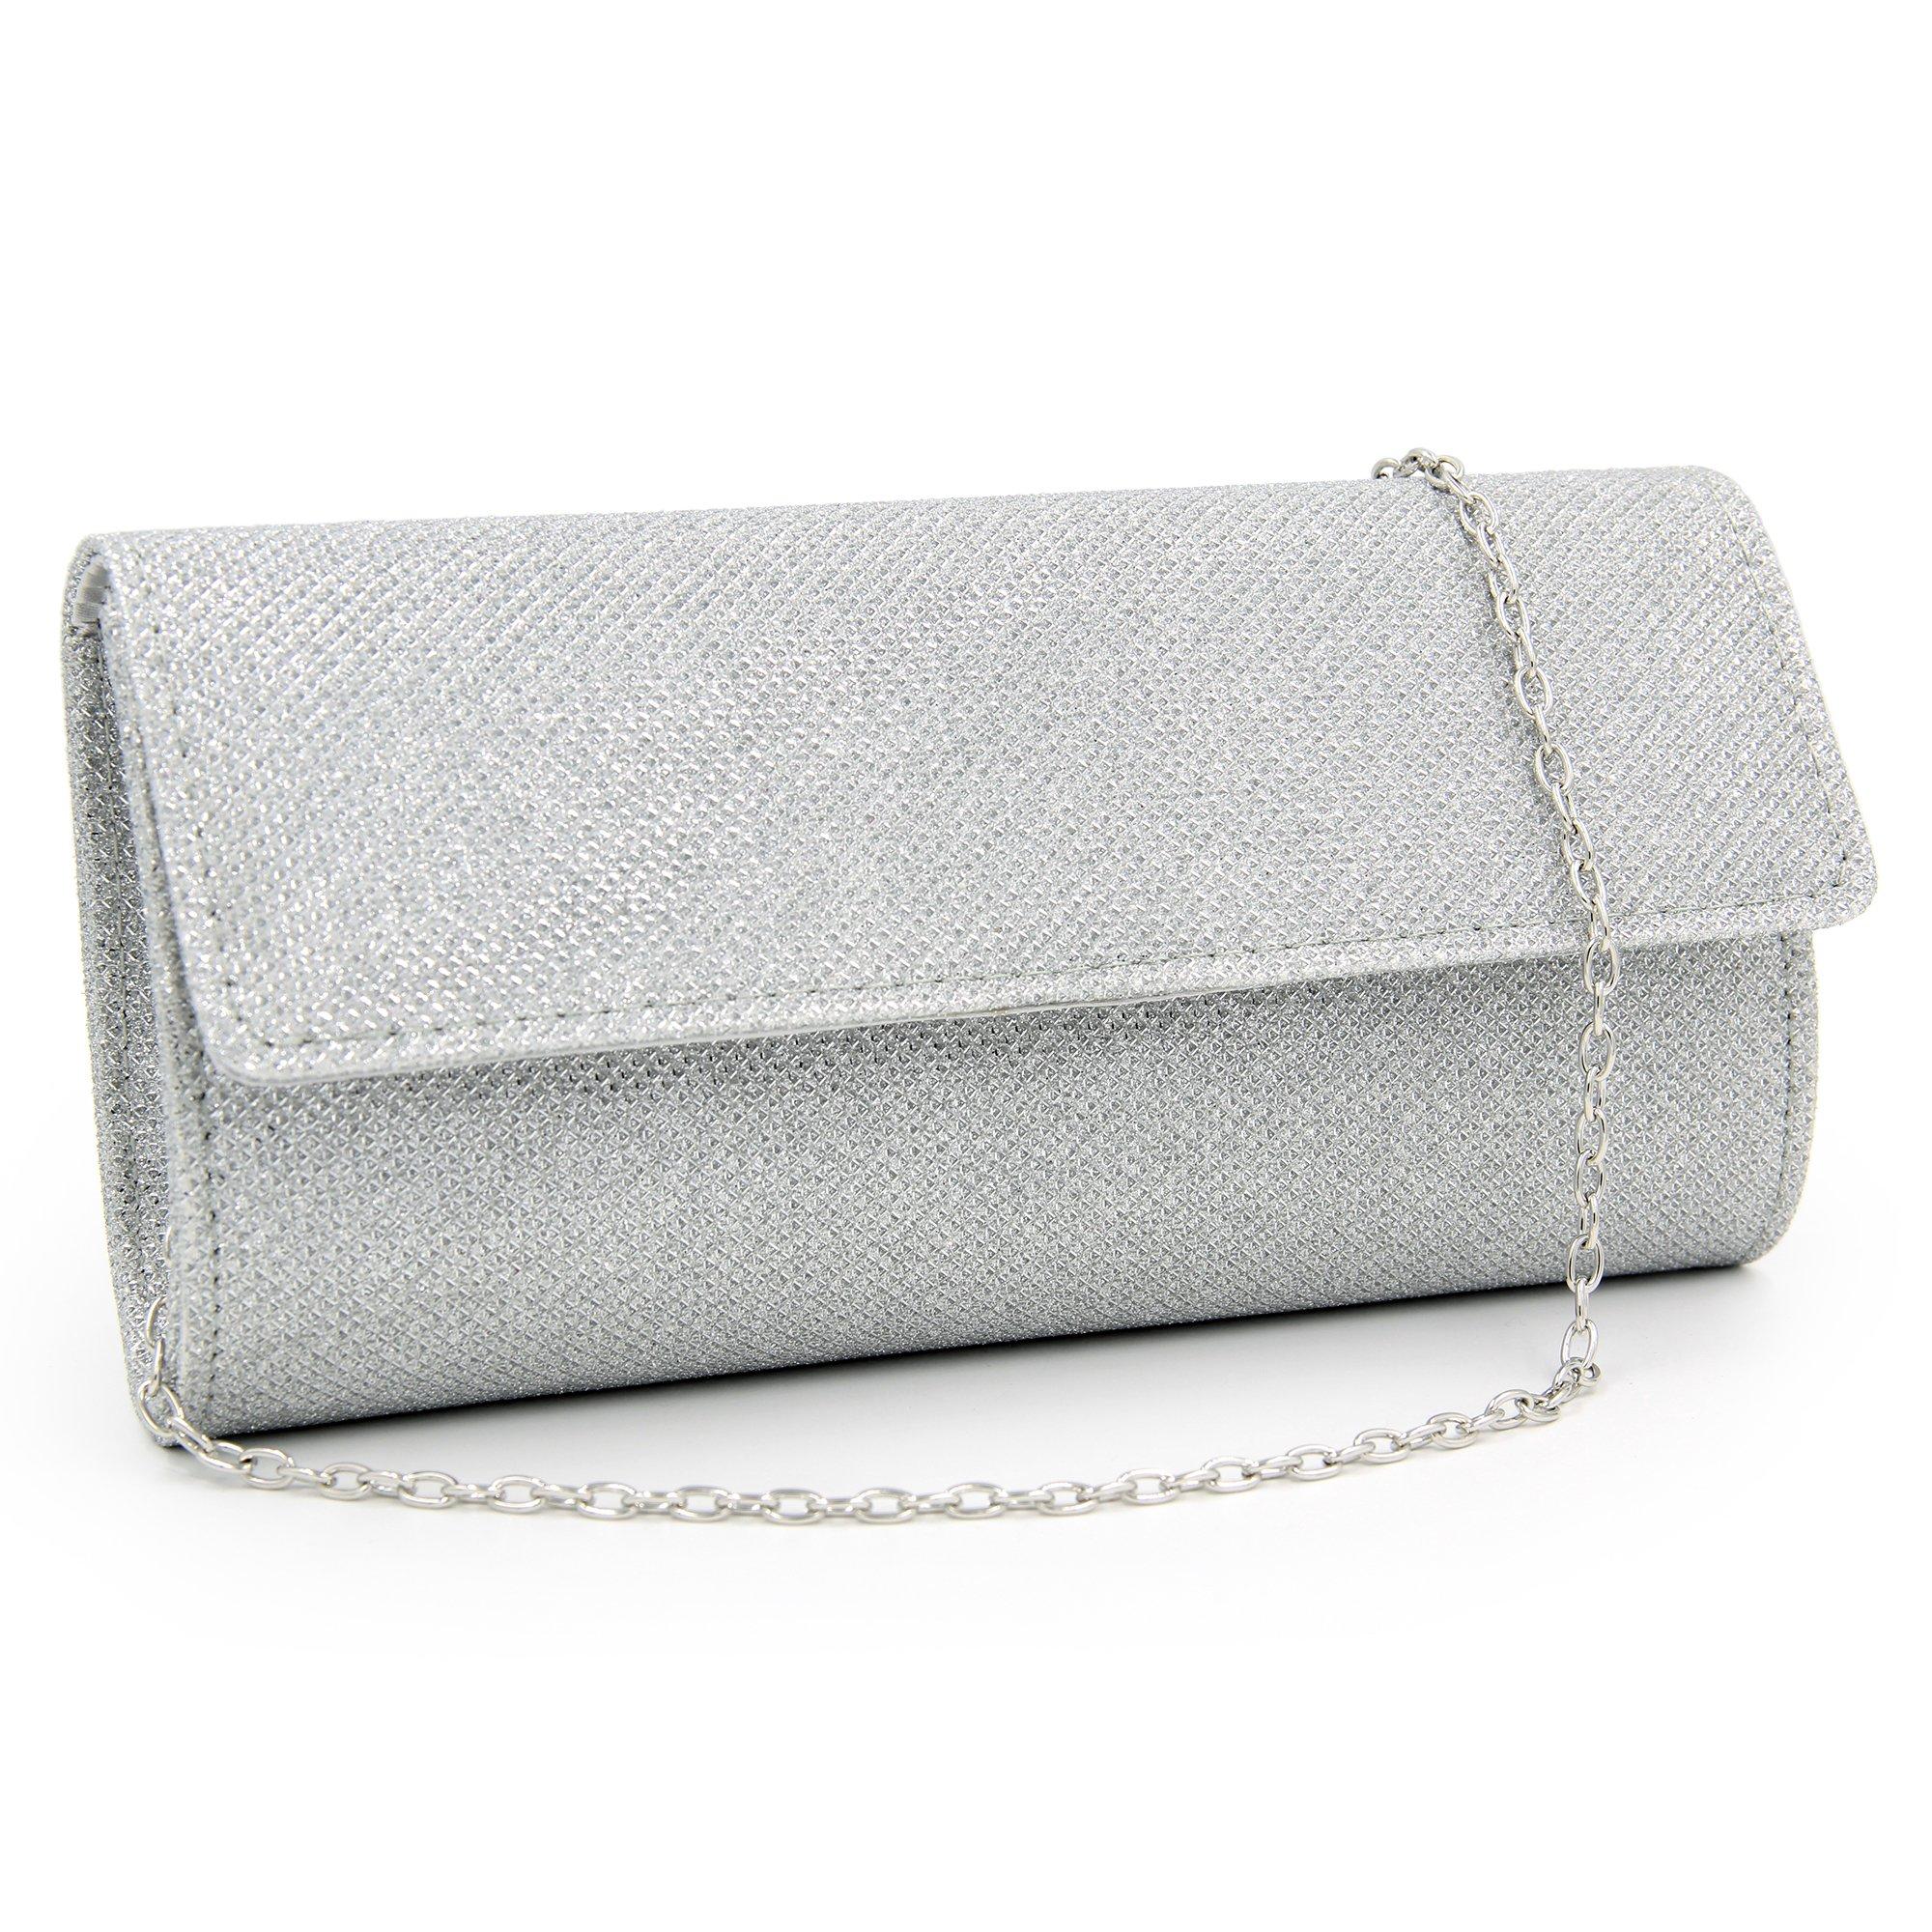 Women Clutches Glitter Evening Bags Party Clutch Purse (silver)